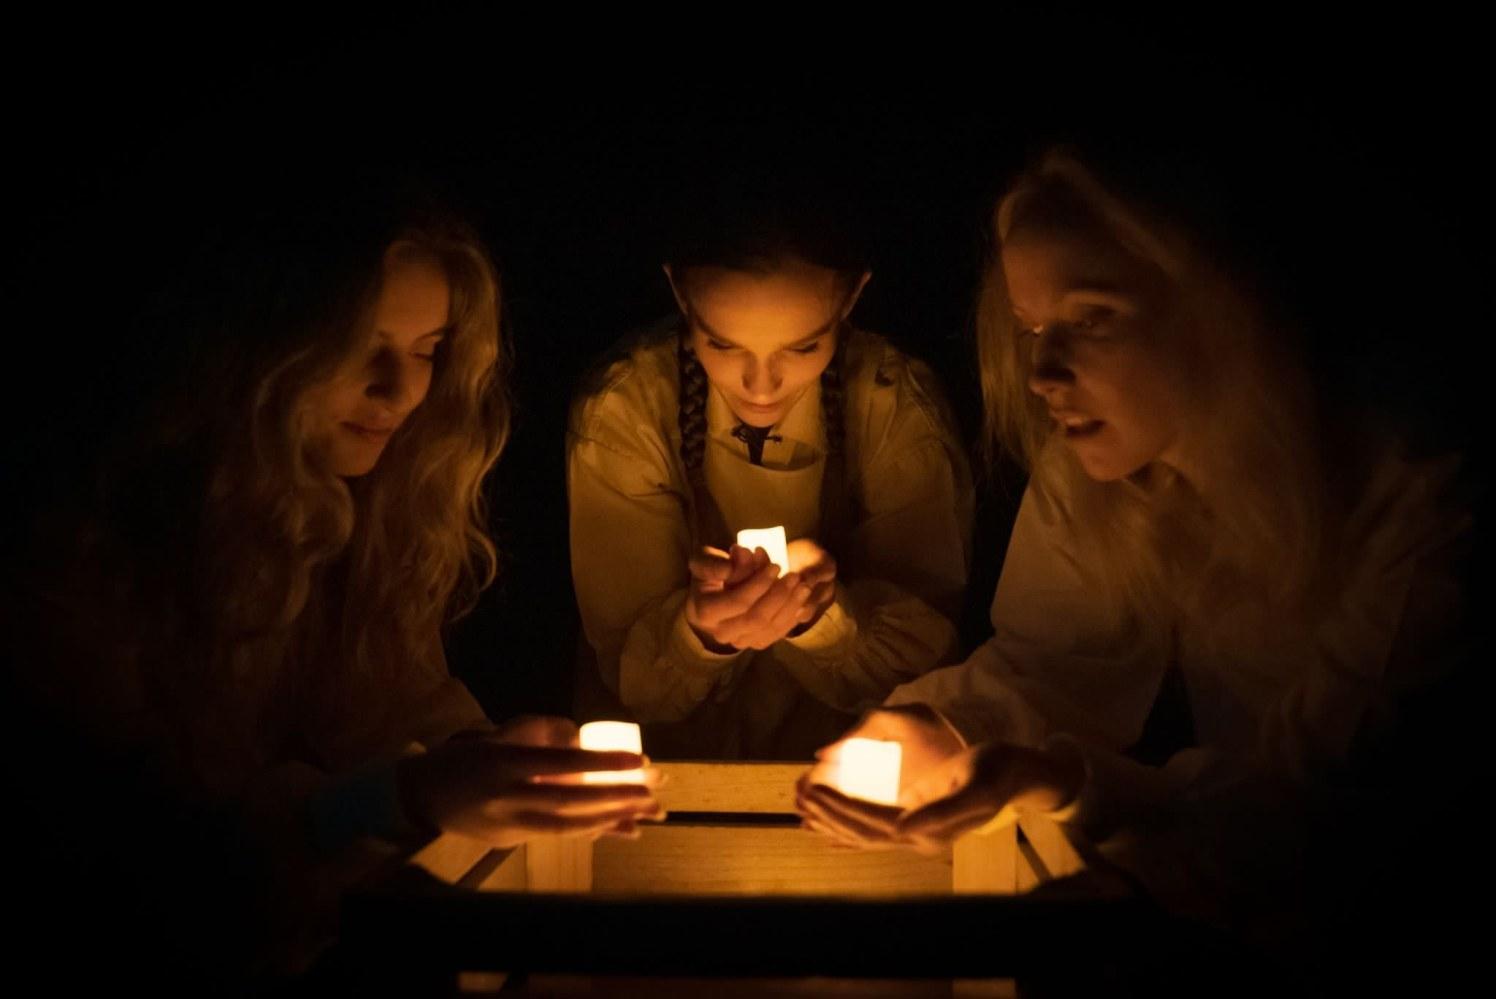 Macbeth - witches